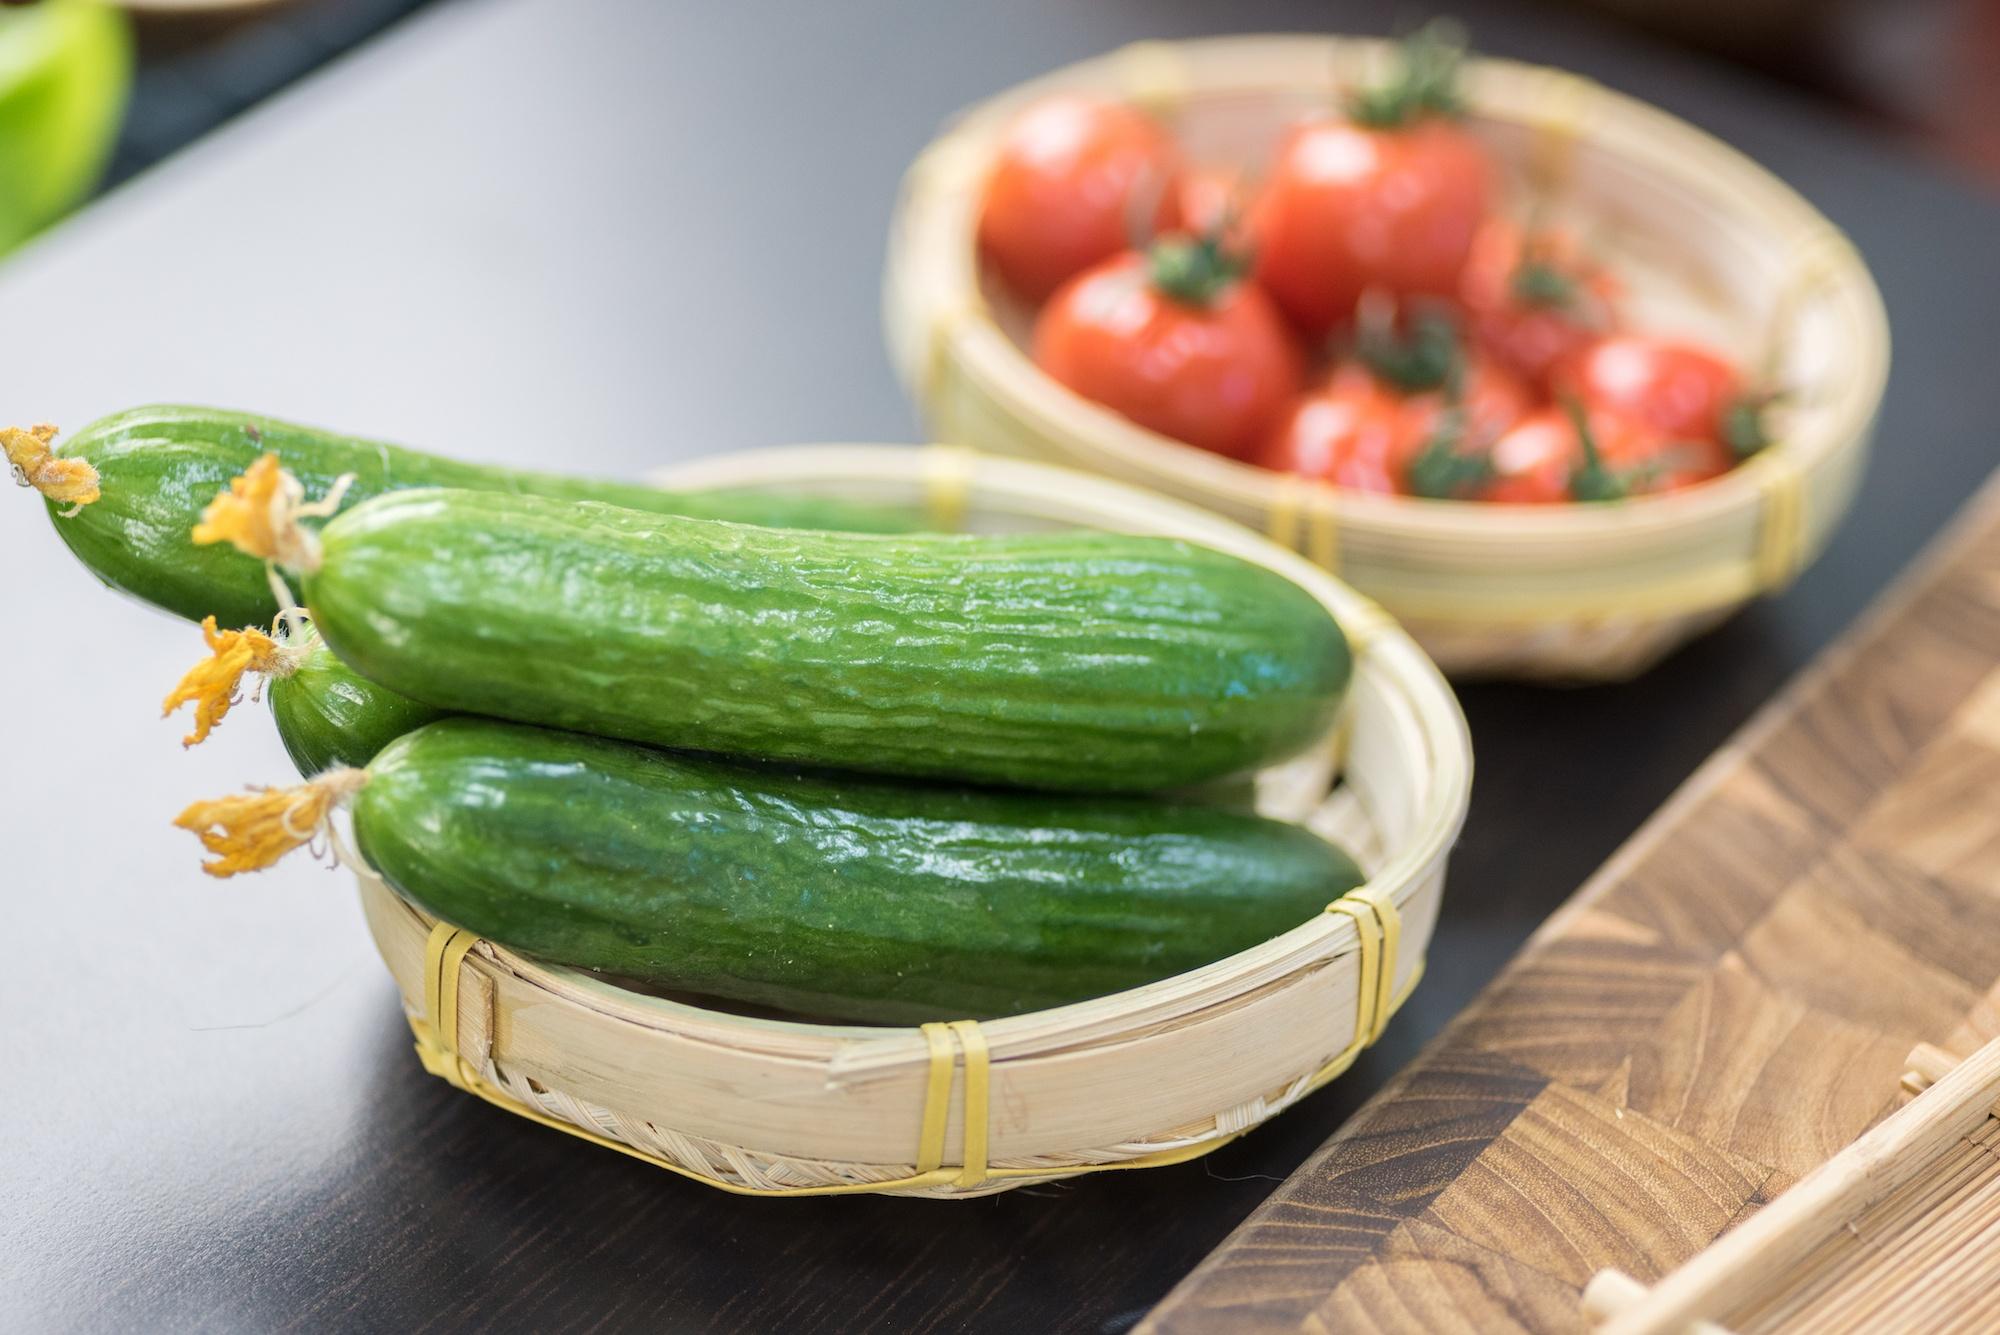 Beautiful Cucumbers And Tomatoes